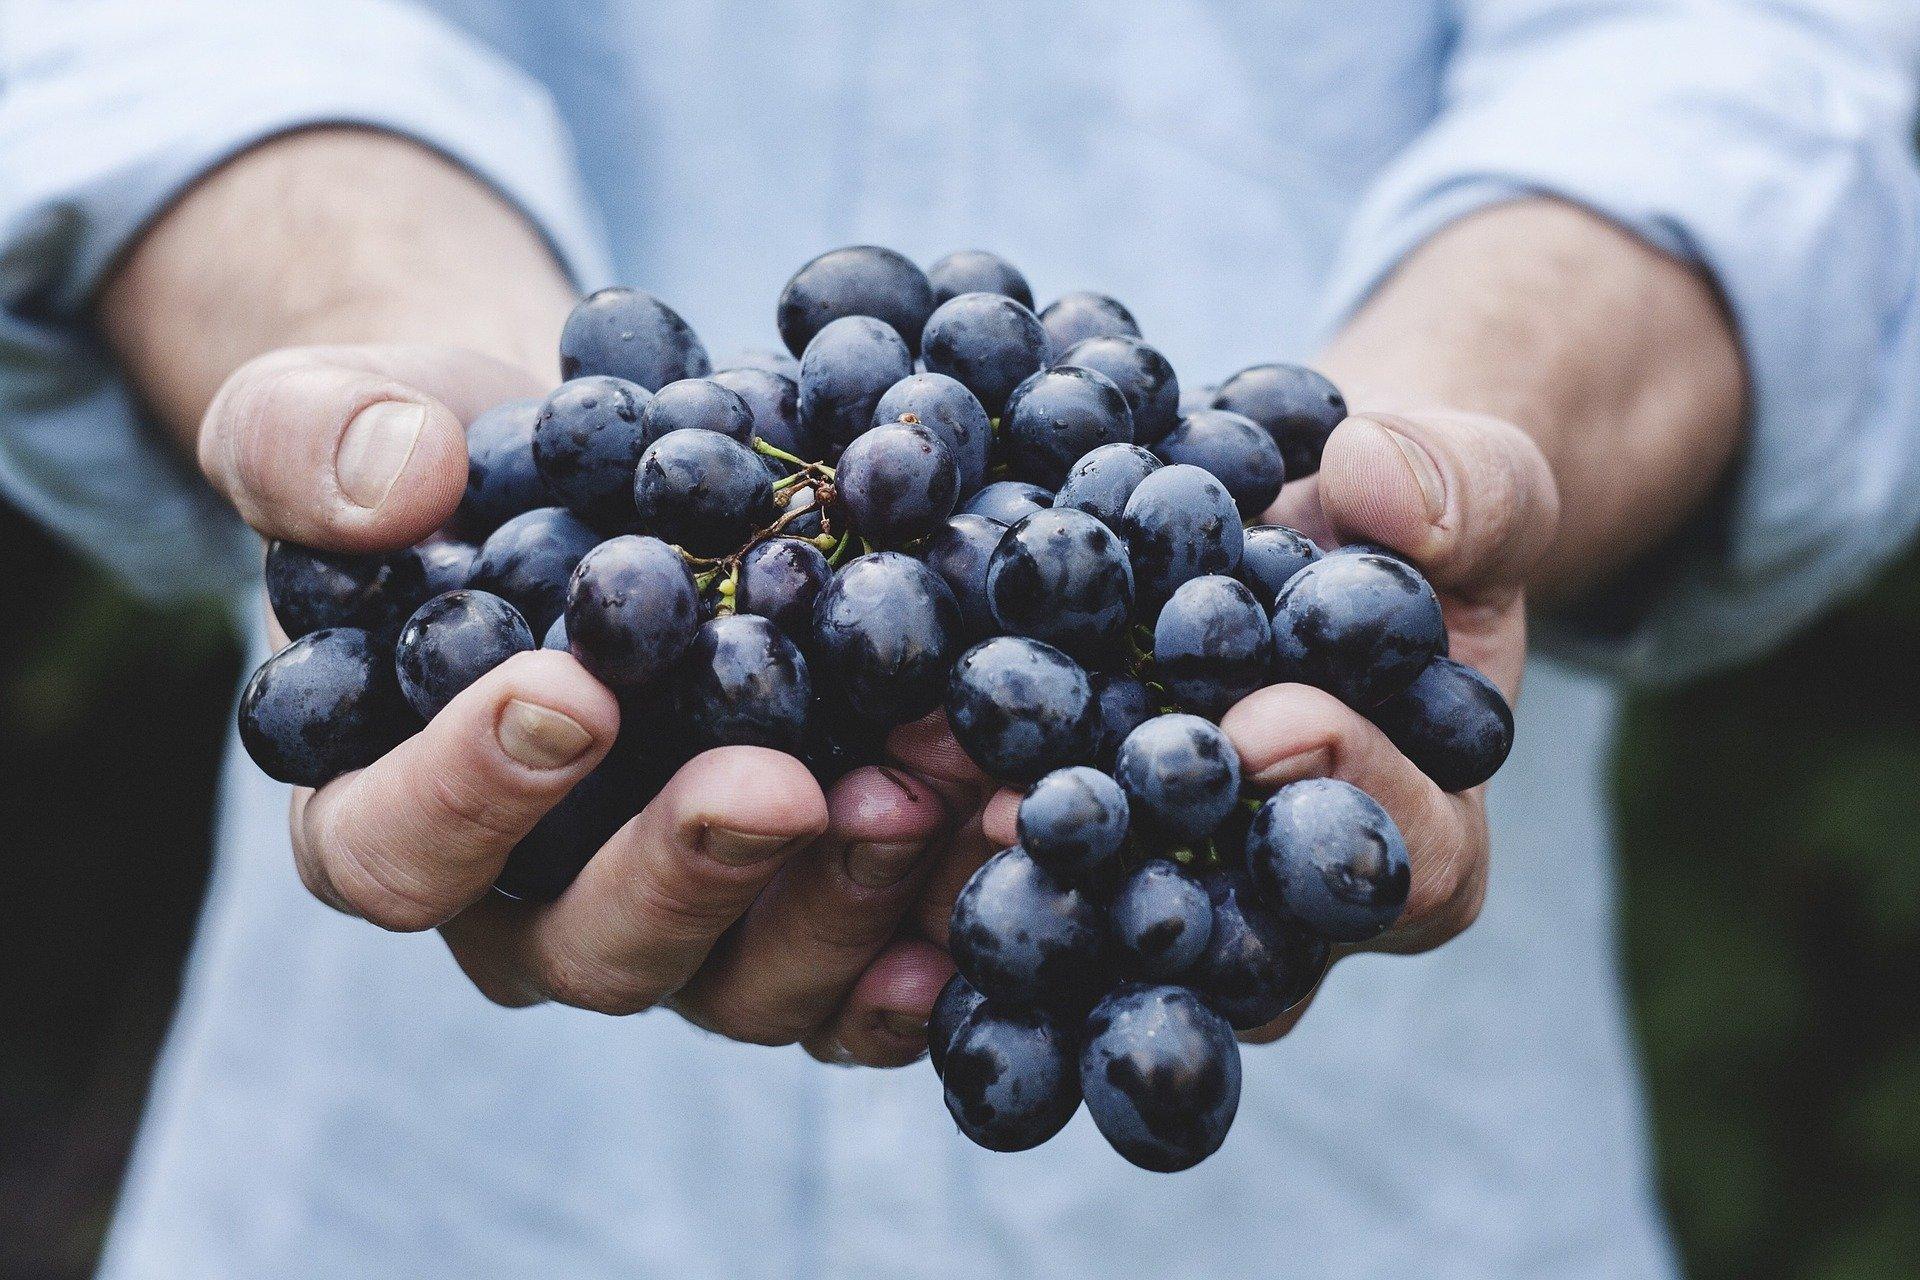 grapes-690230 1920